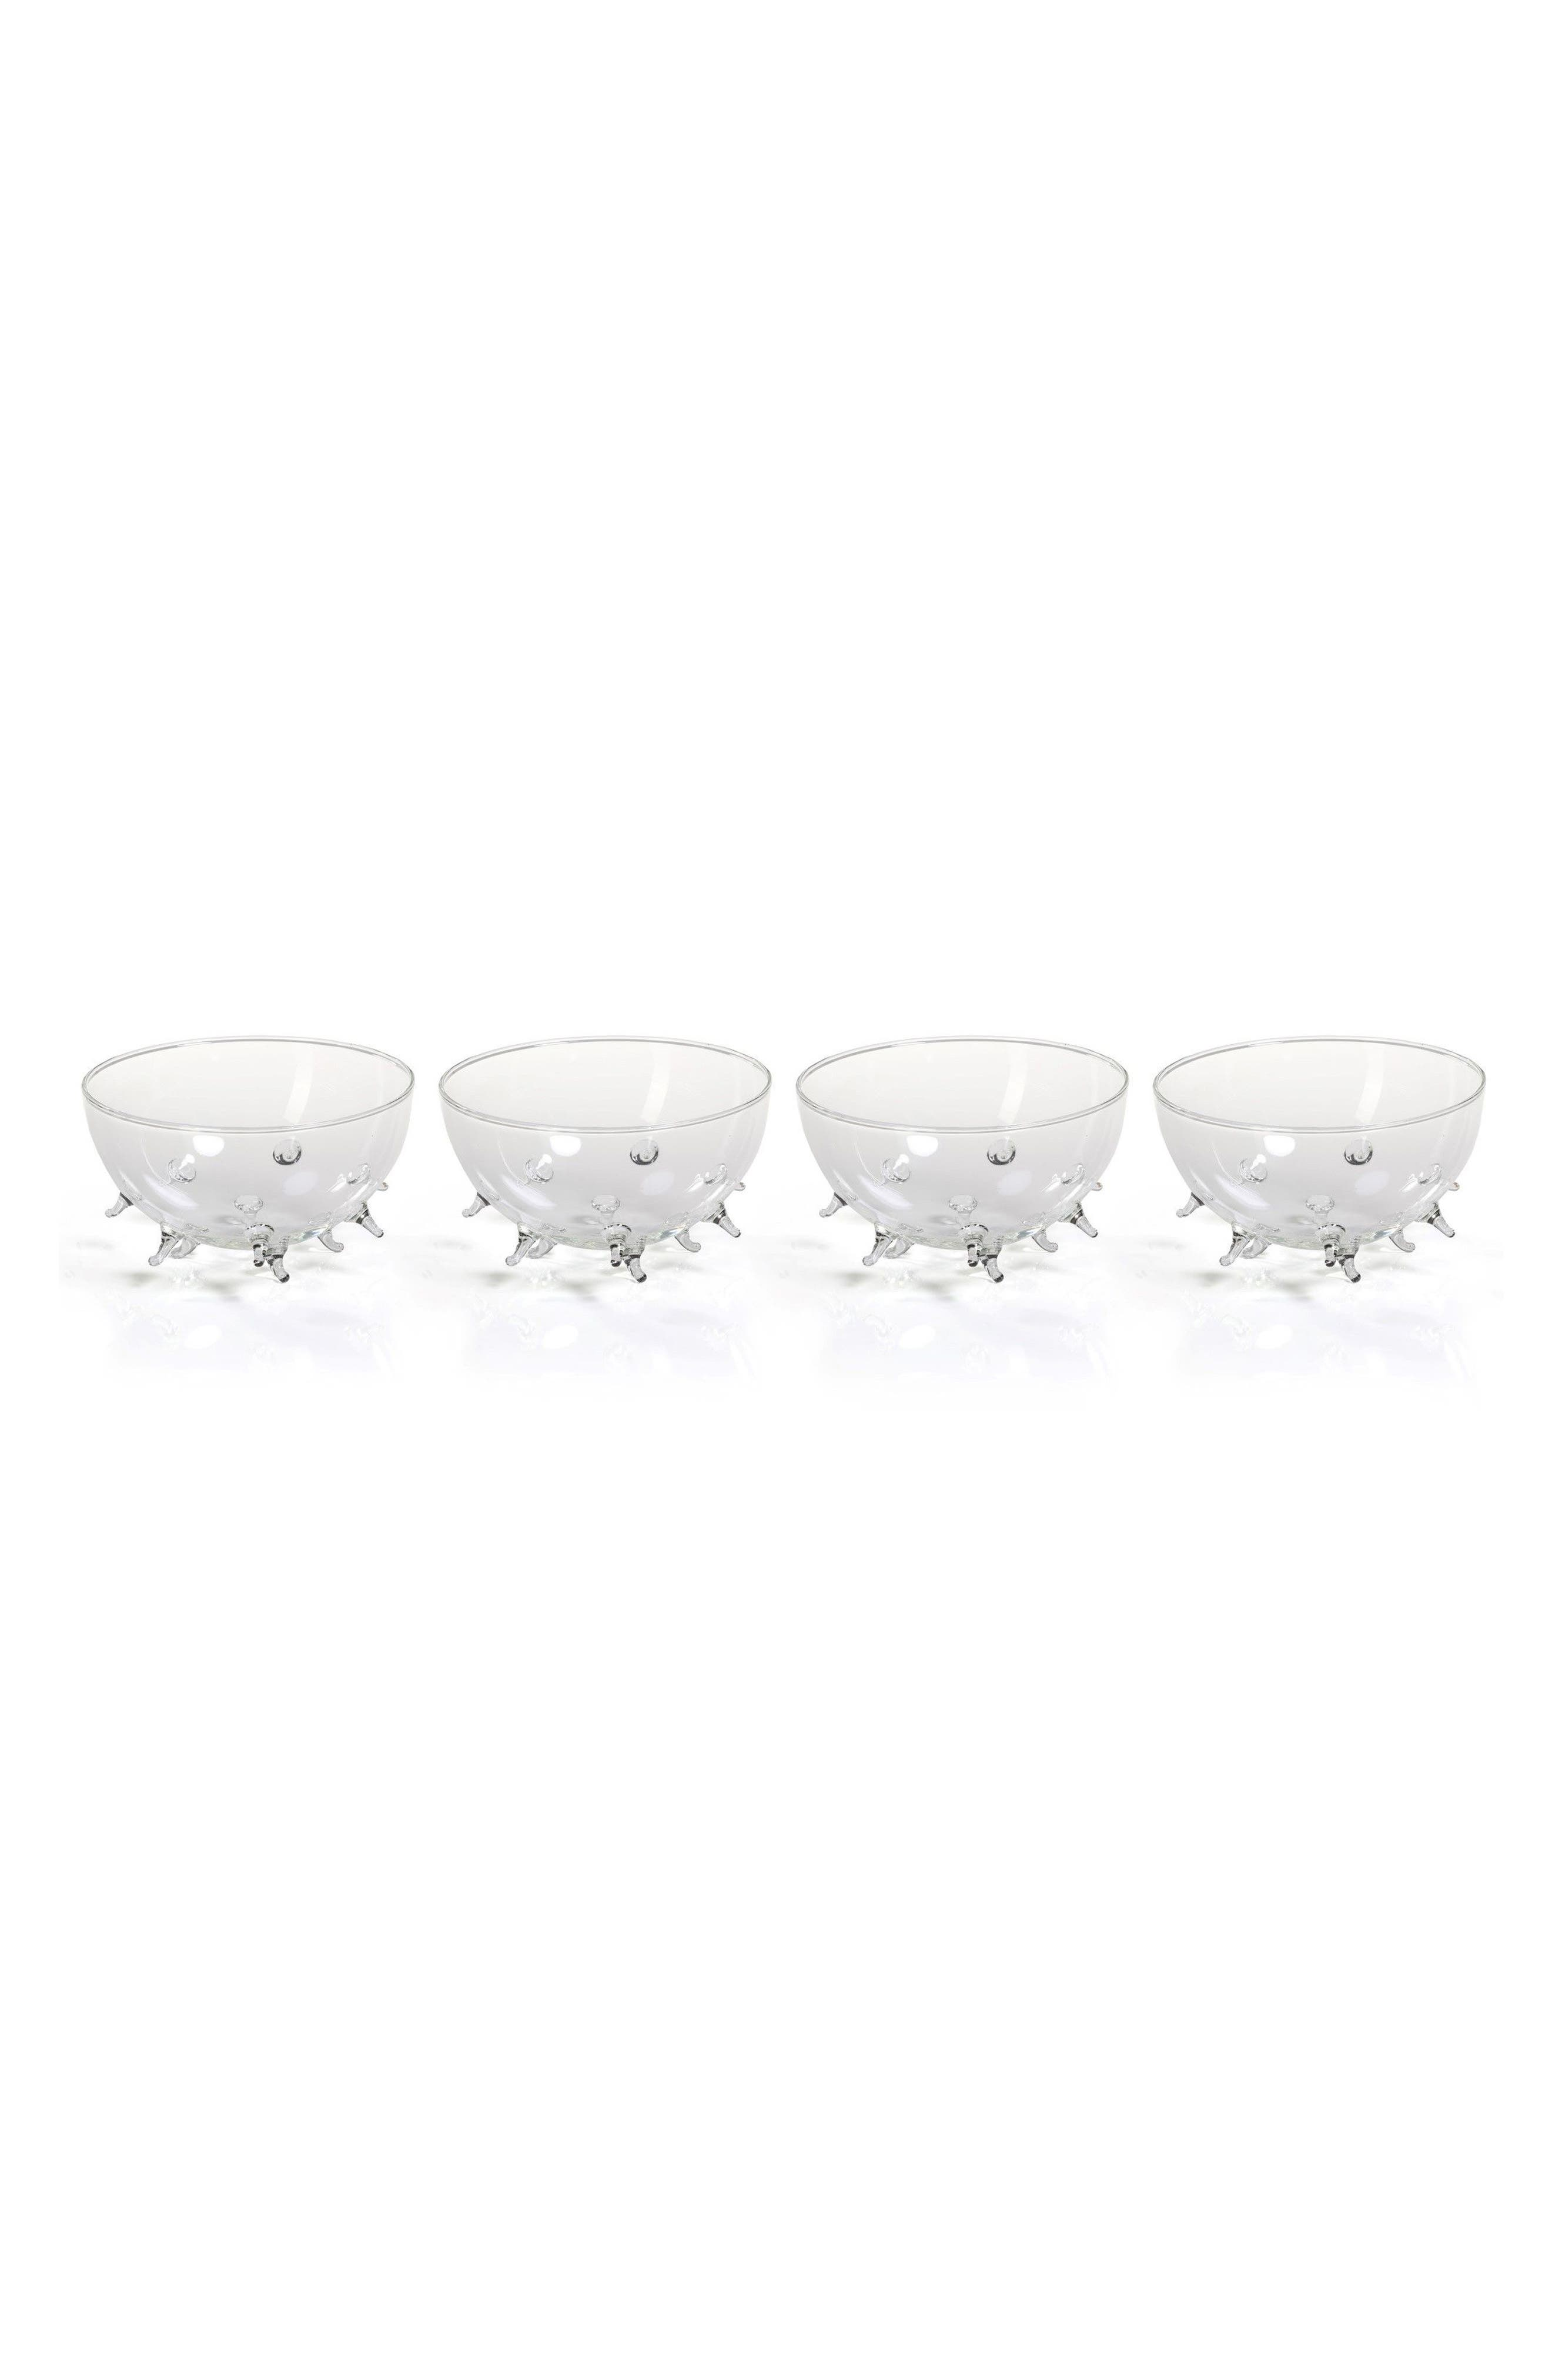 Suri Set of 4 Bowls,                             Main thumbnail 1, color,                             Clear